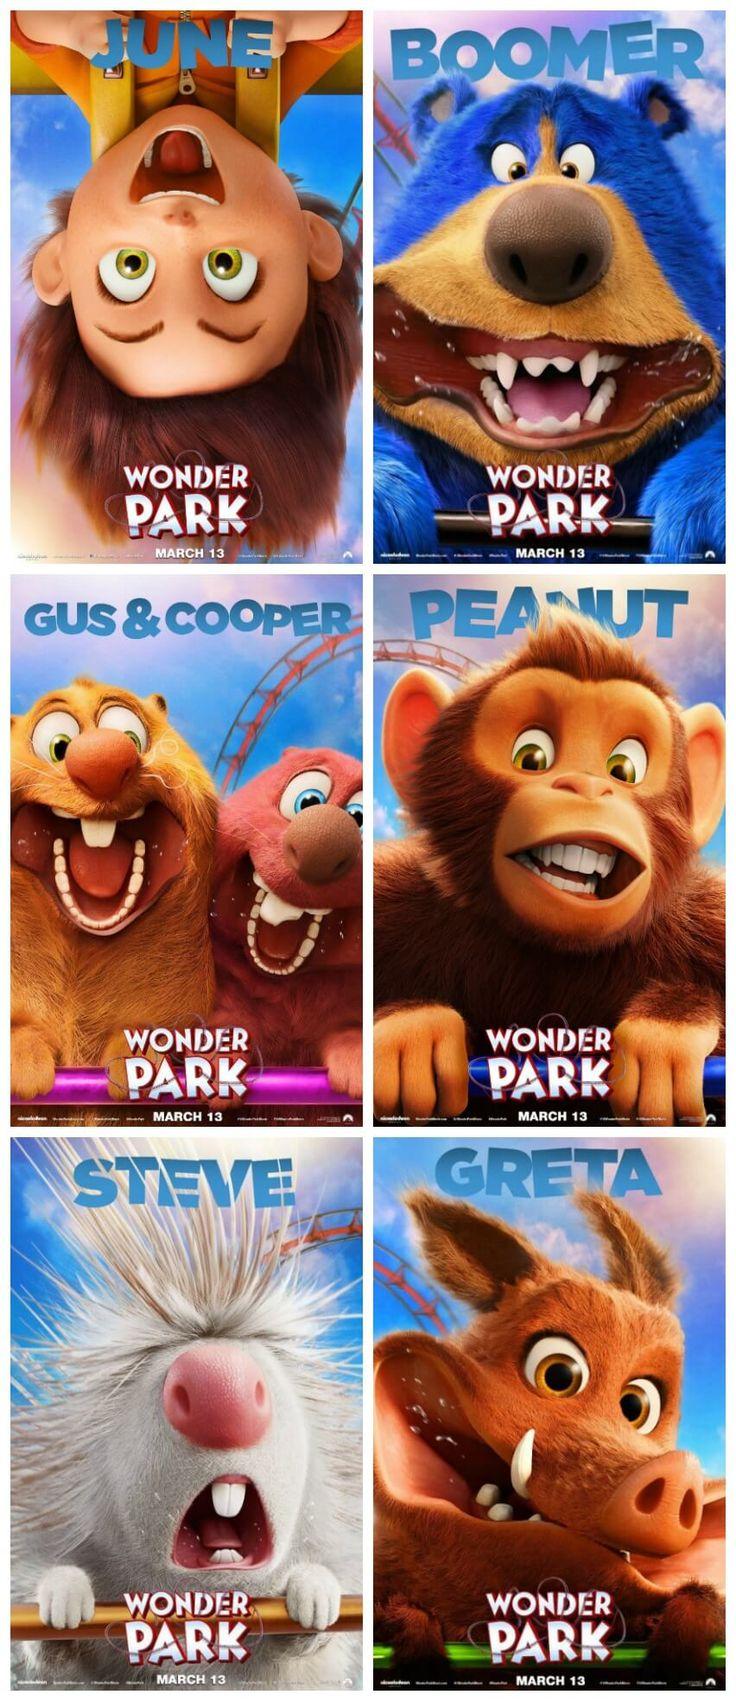 Wonder Park Celebrates Childhood and Imagination 5